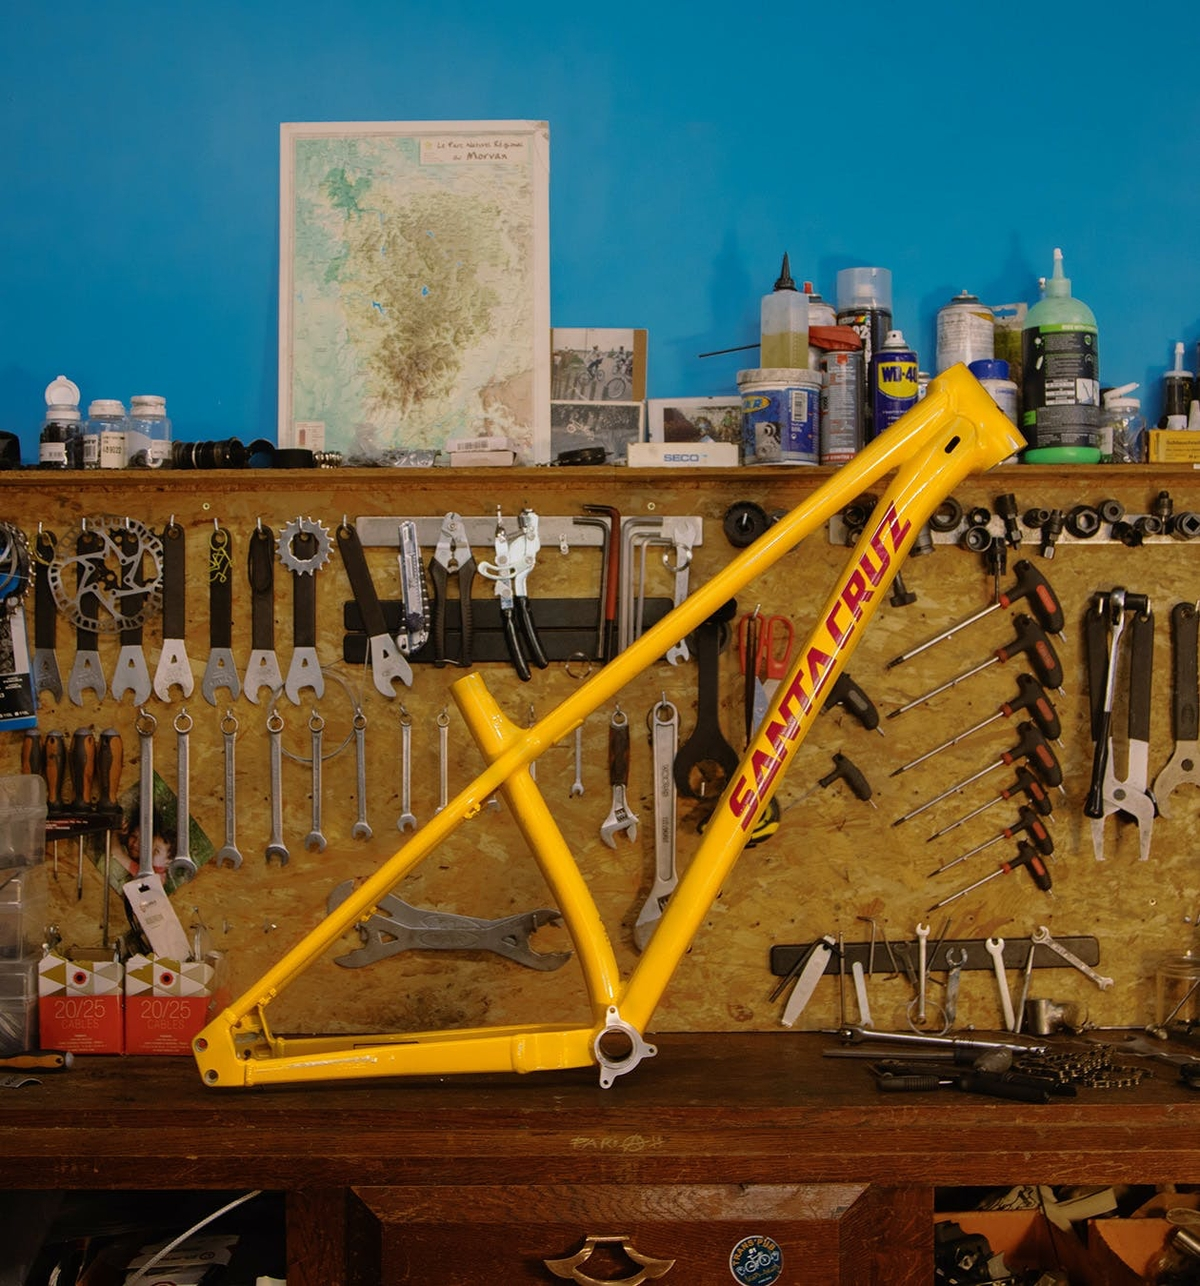 2022 Santa Cruz Bicycles Chameleon 8 yellow and magenta frame